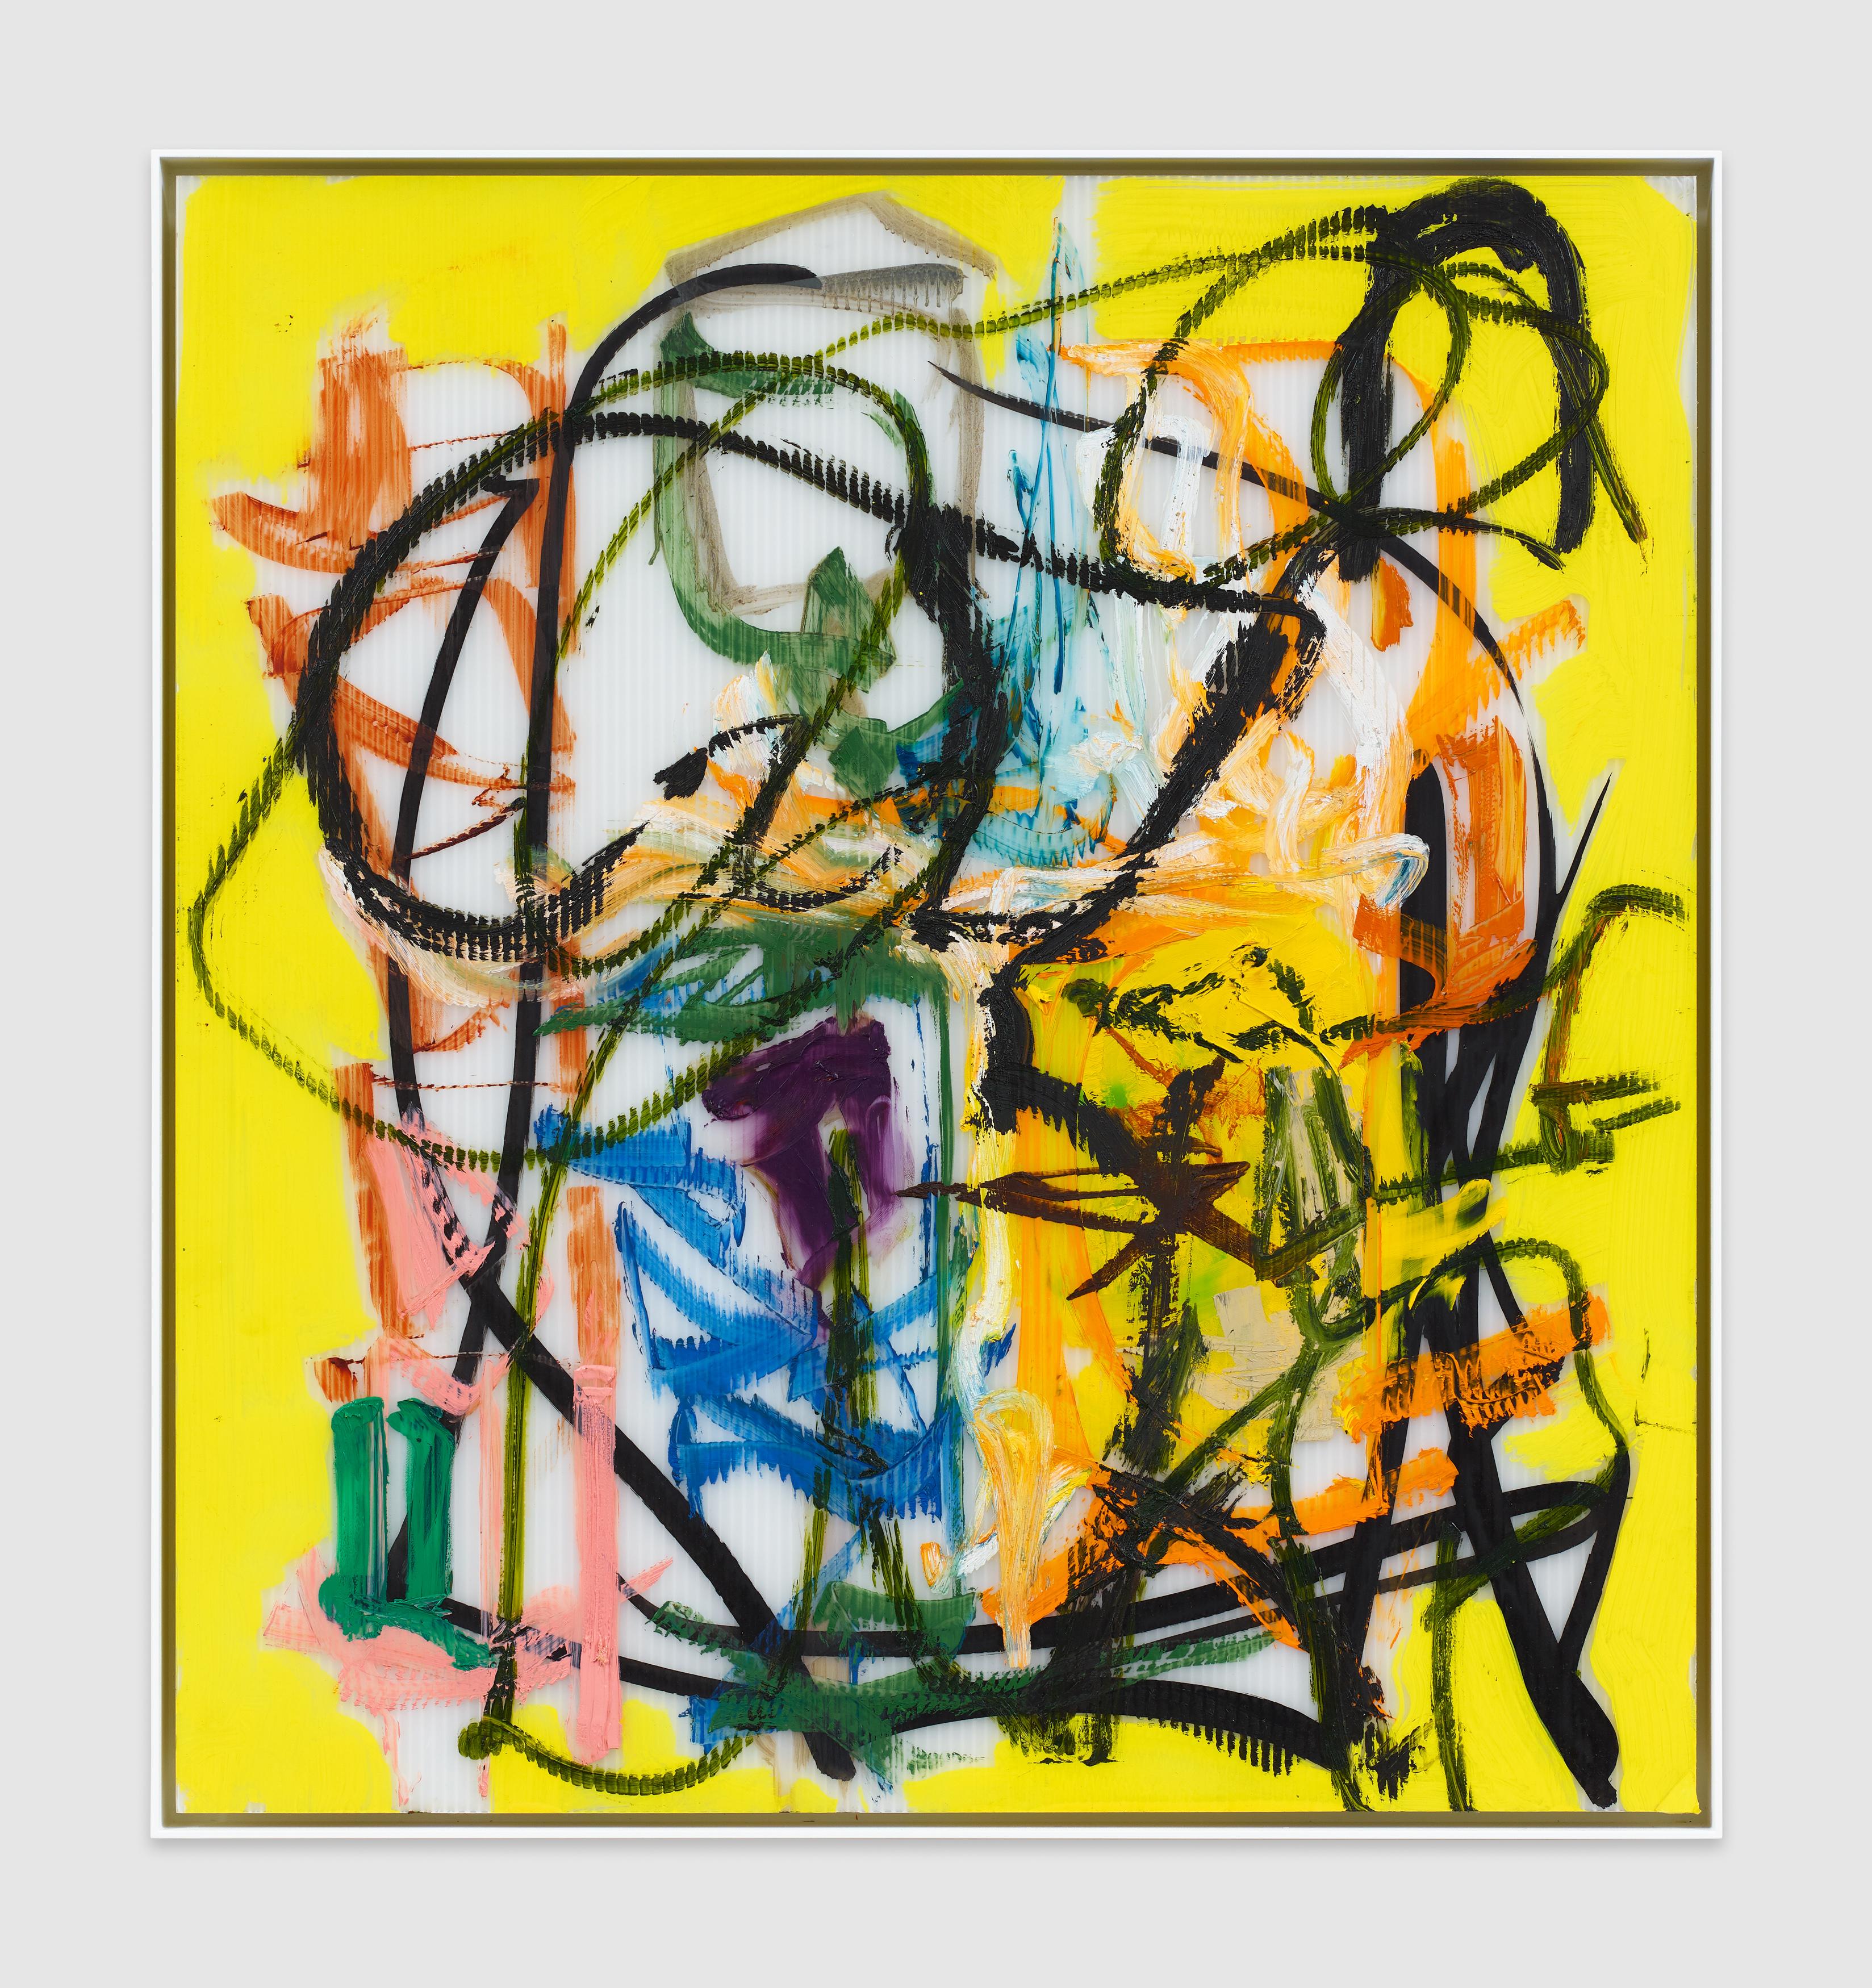 Aaron Garber-Maikovska, <em>TBT</em>, 2020. Courtesy the artist and CLEARING.